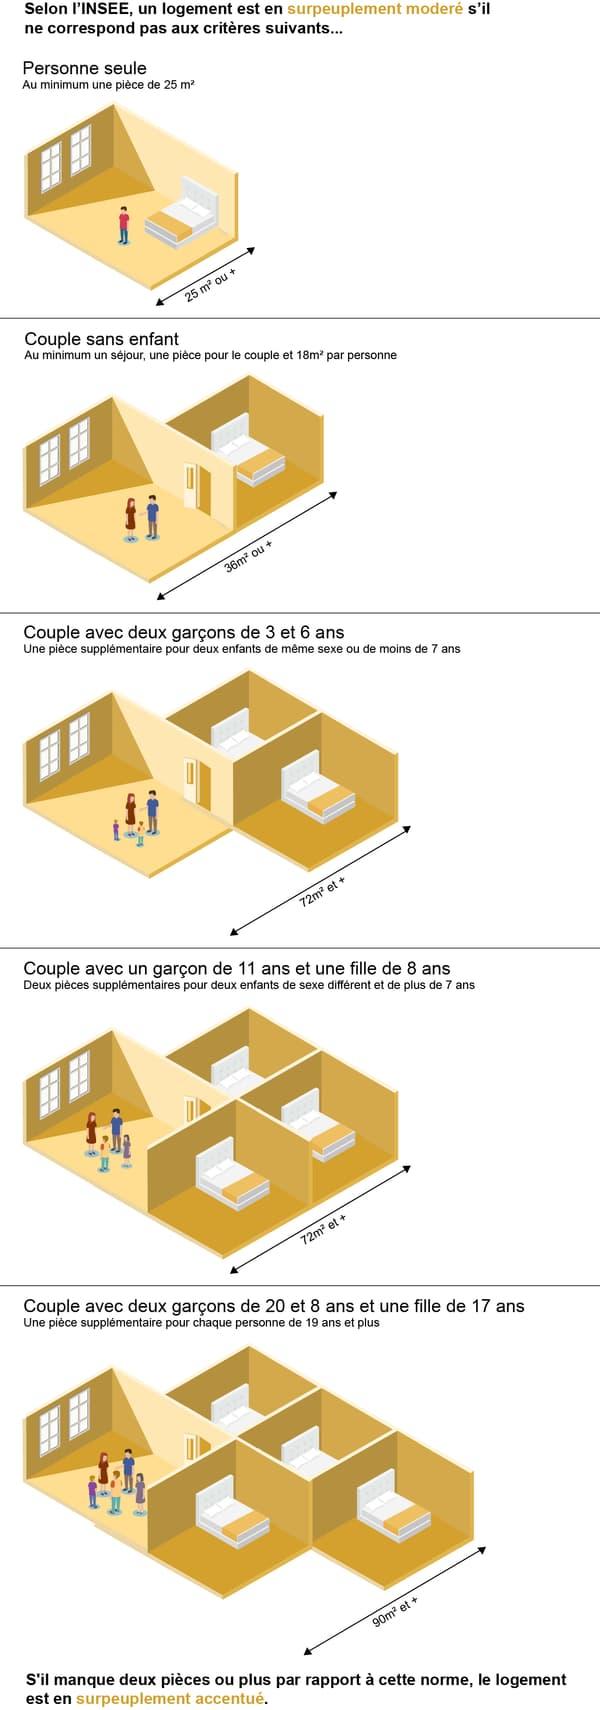 infographie surpeuplement